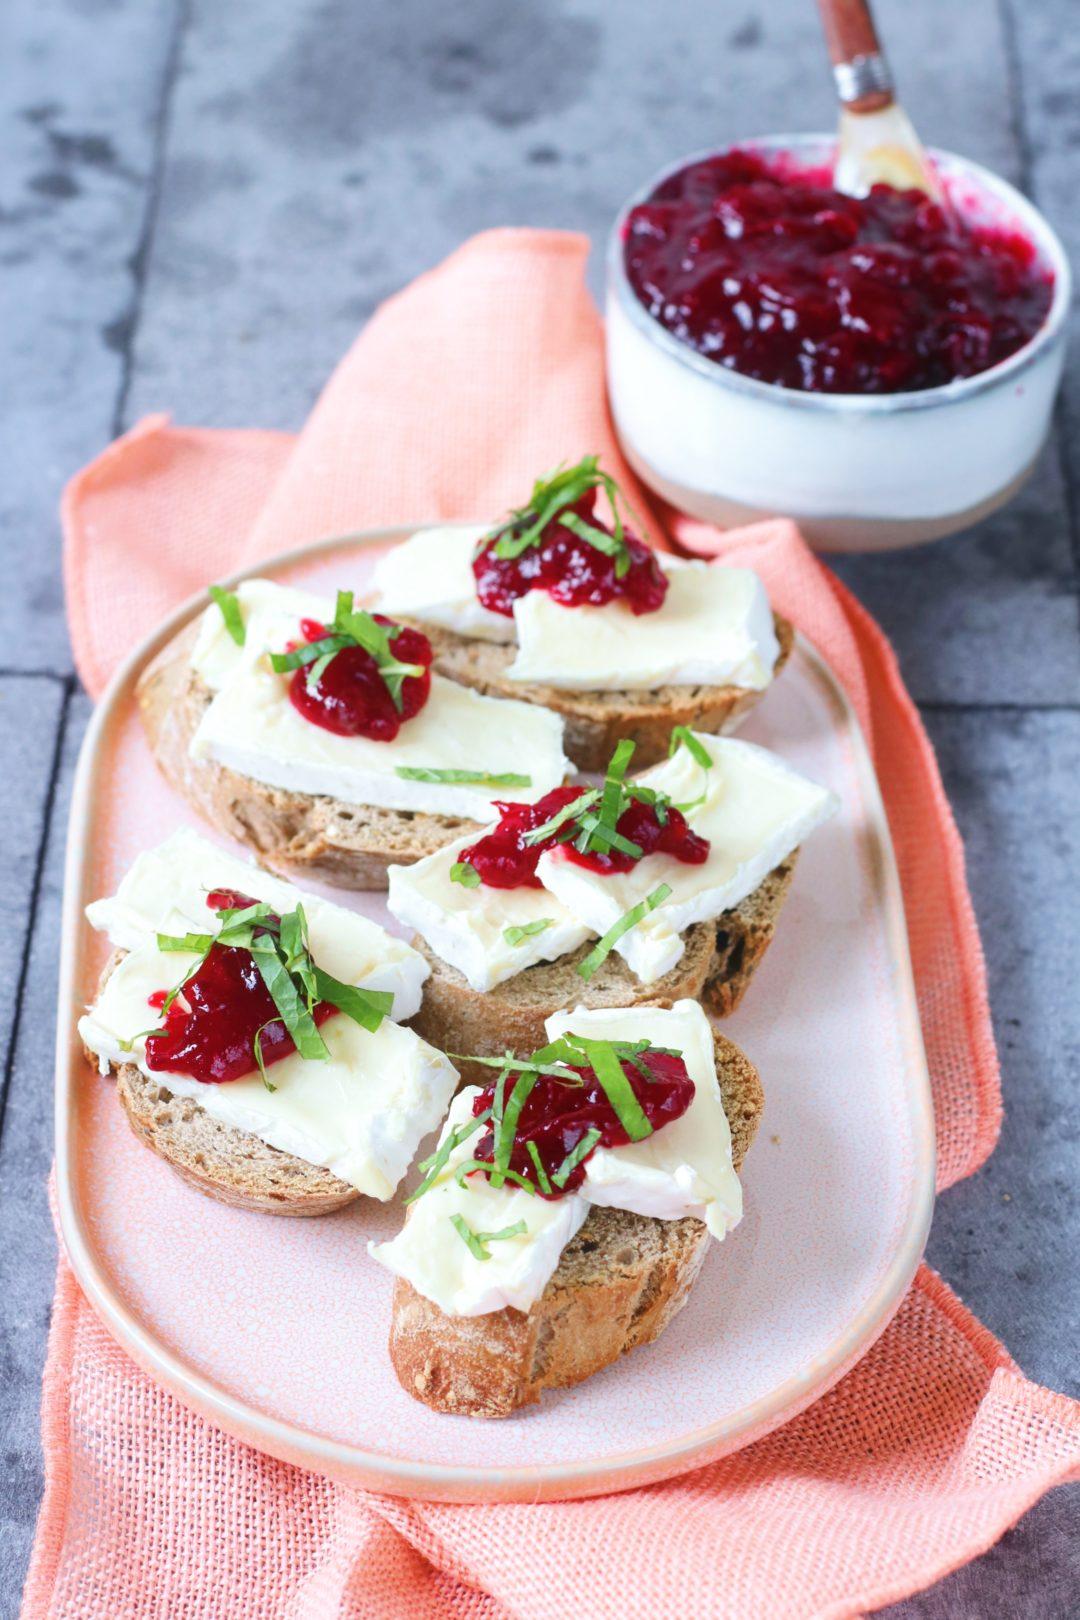 Recept crostini cranberry en brie www.jaimyskitchen.nl